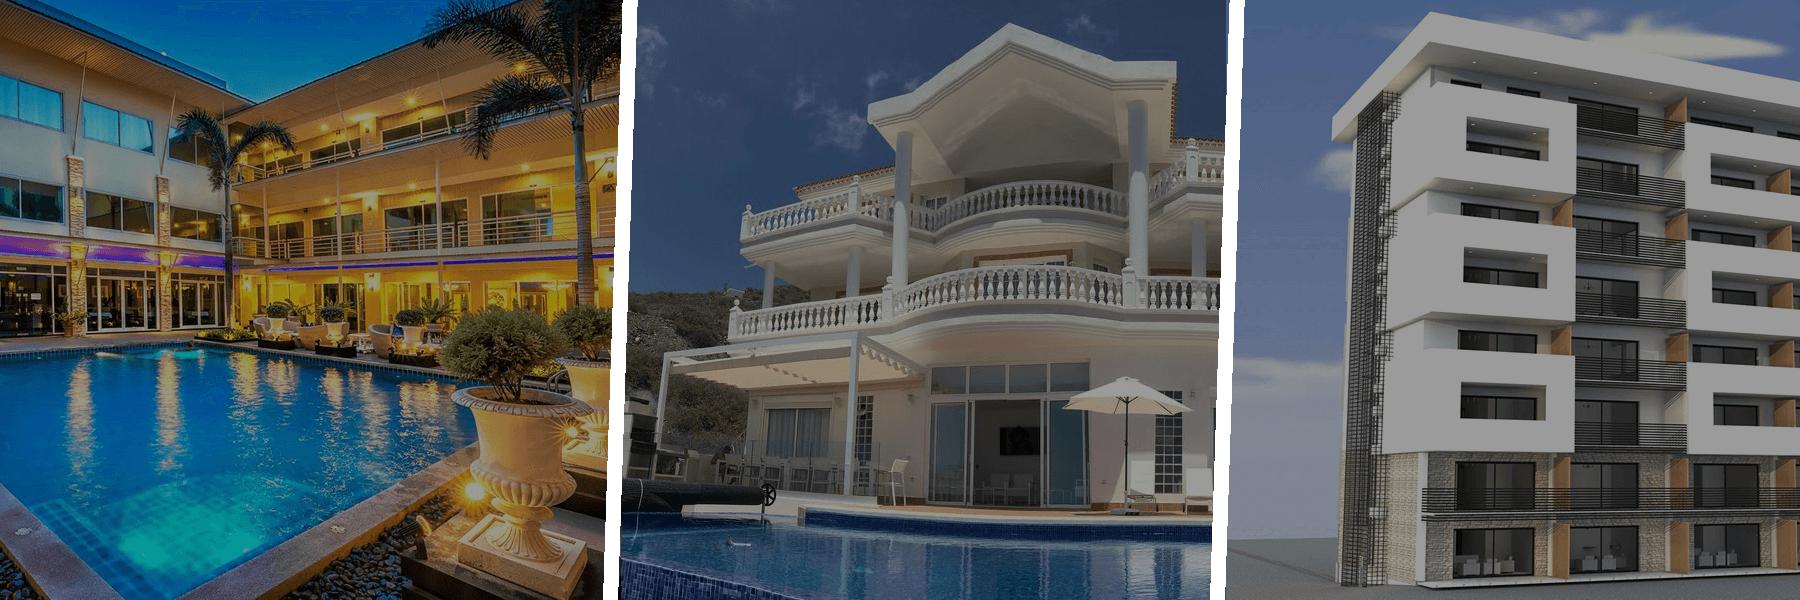 Hôtel-Villa-Immeuble-Marrakech-Fès